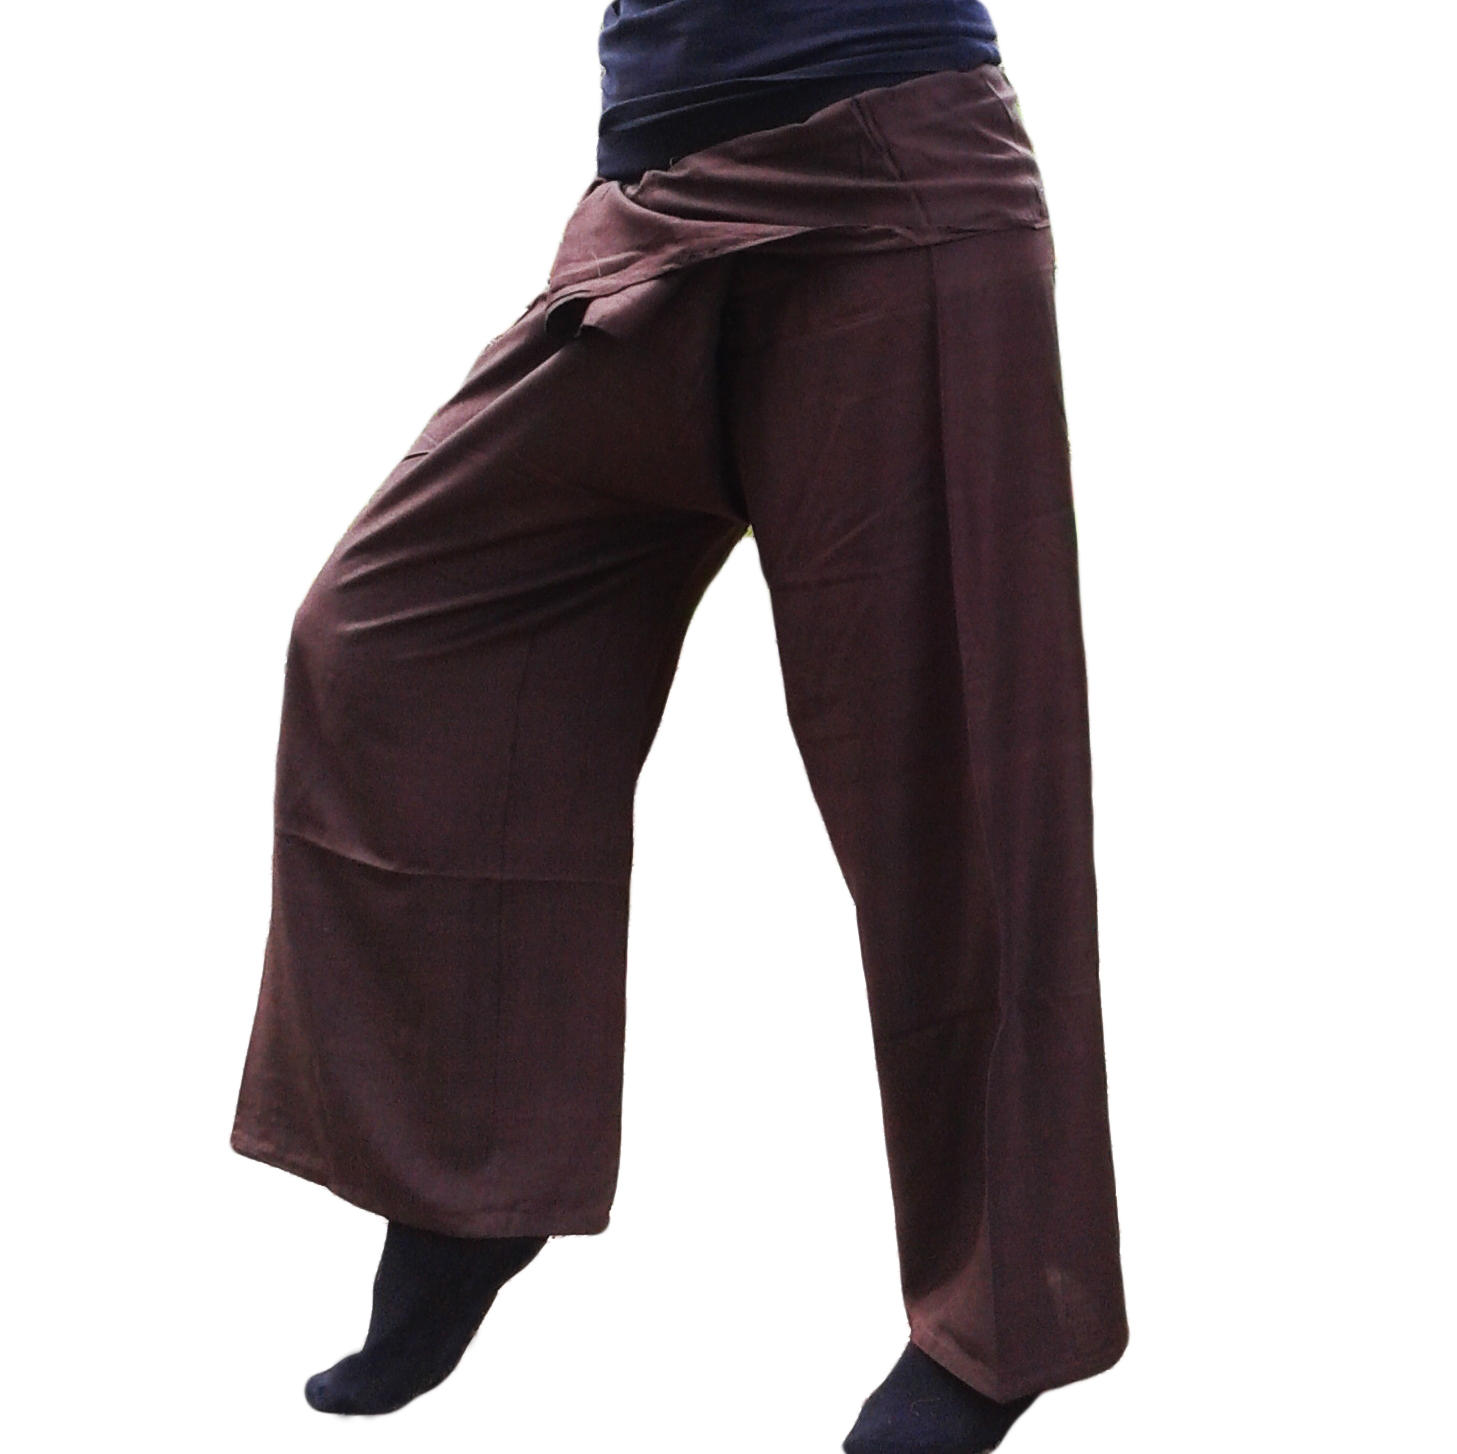 pantalon thaï Arasia marron